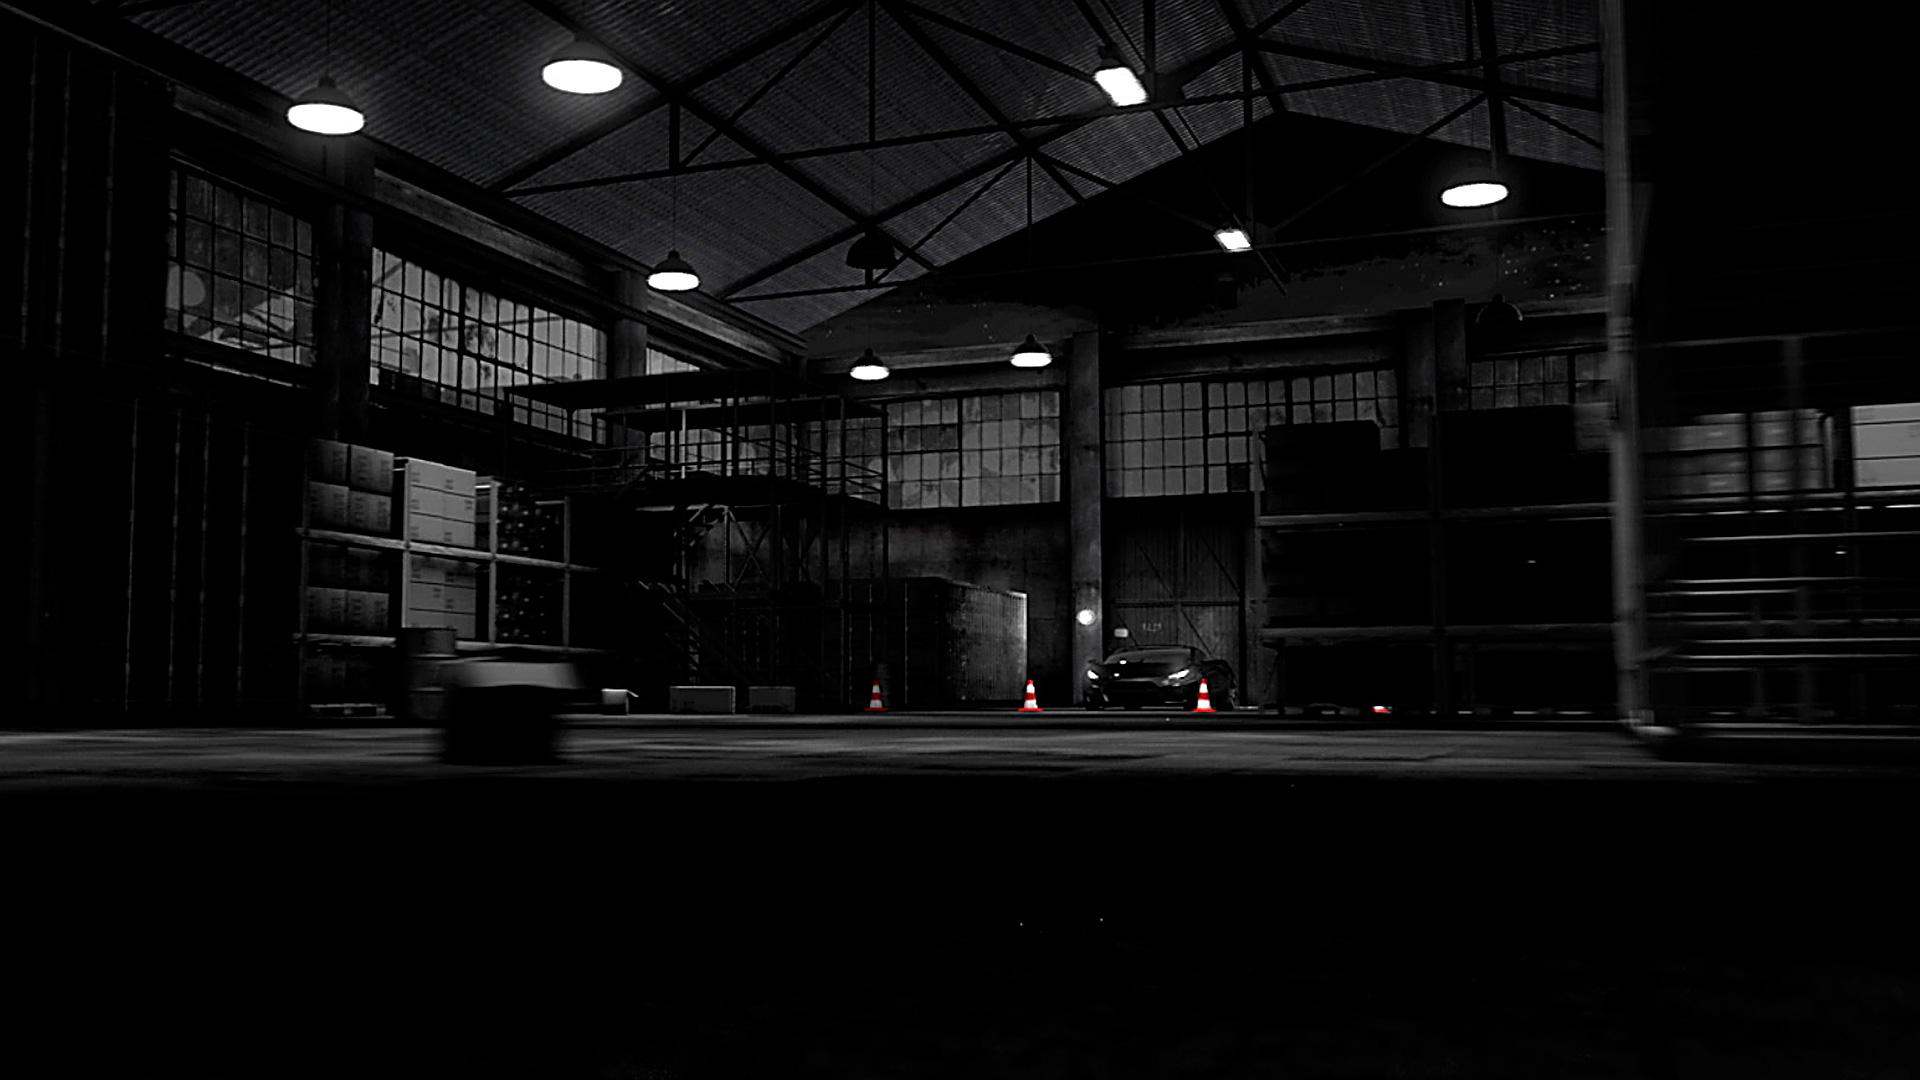 BrakeOnThrough1-1080p